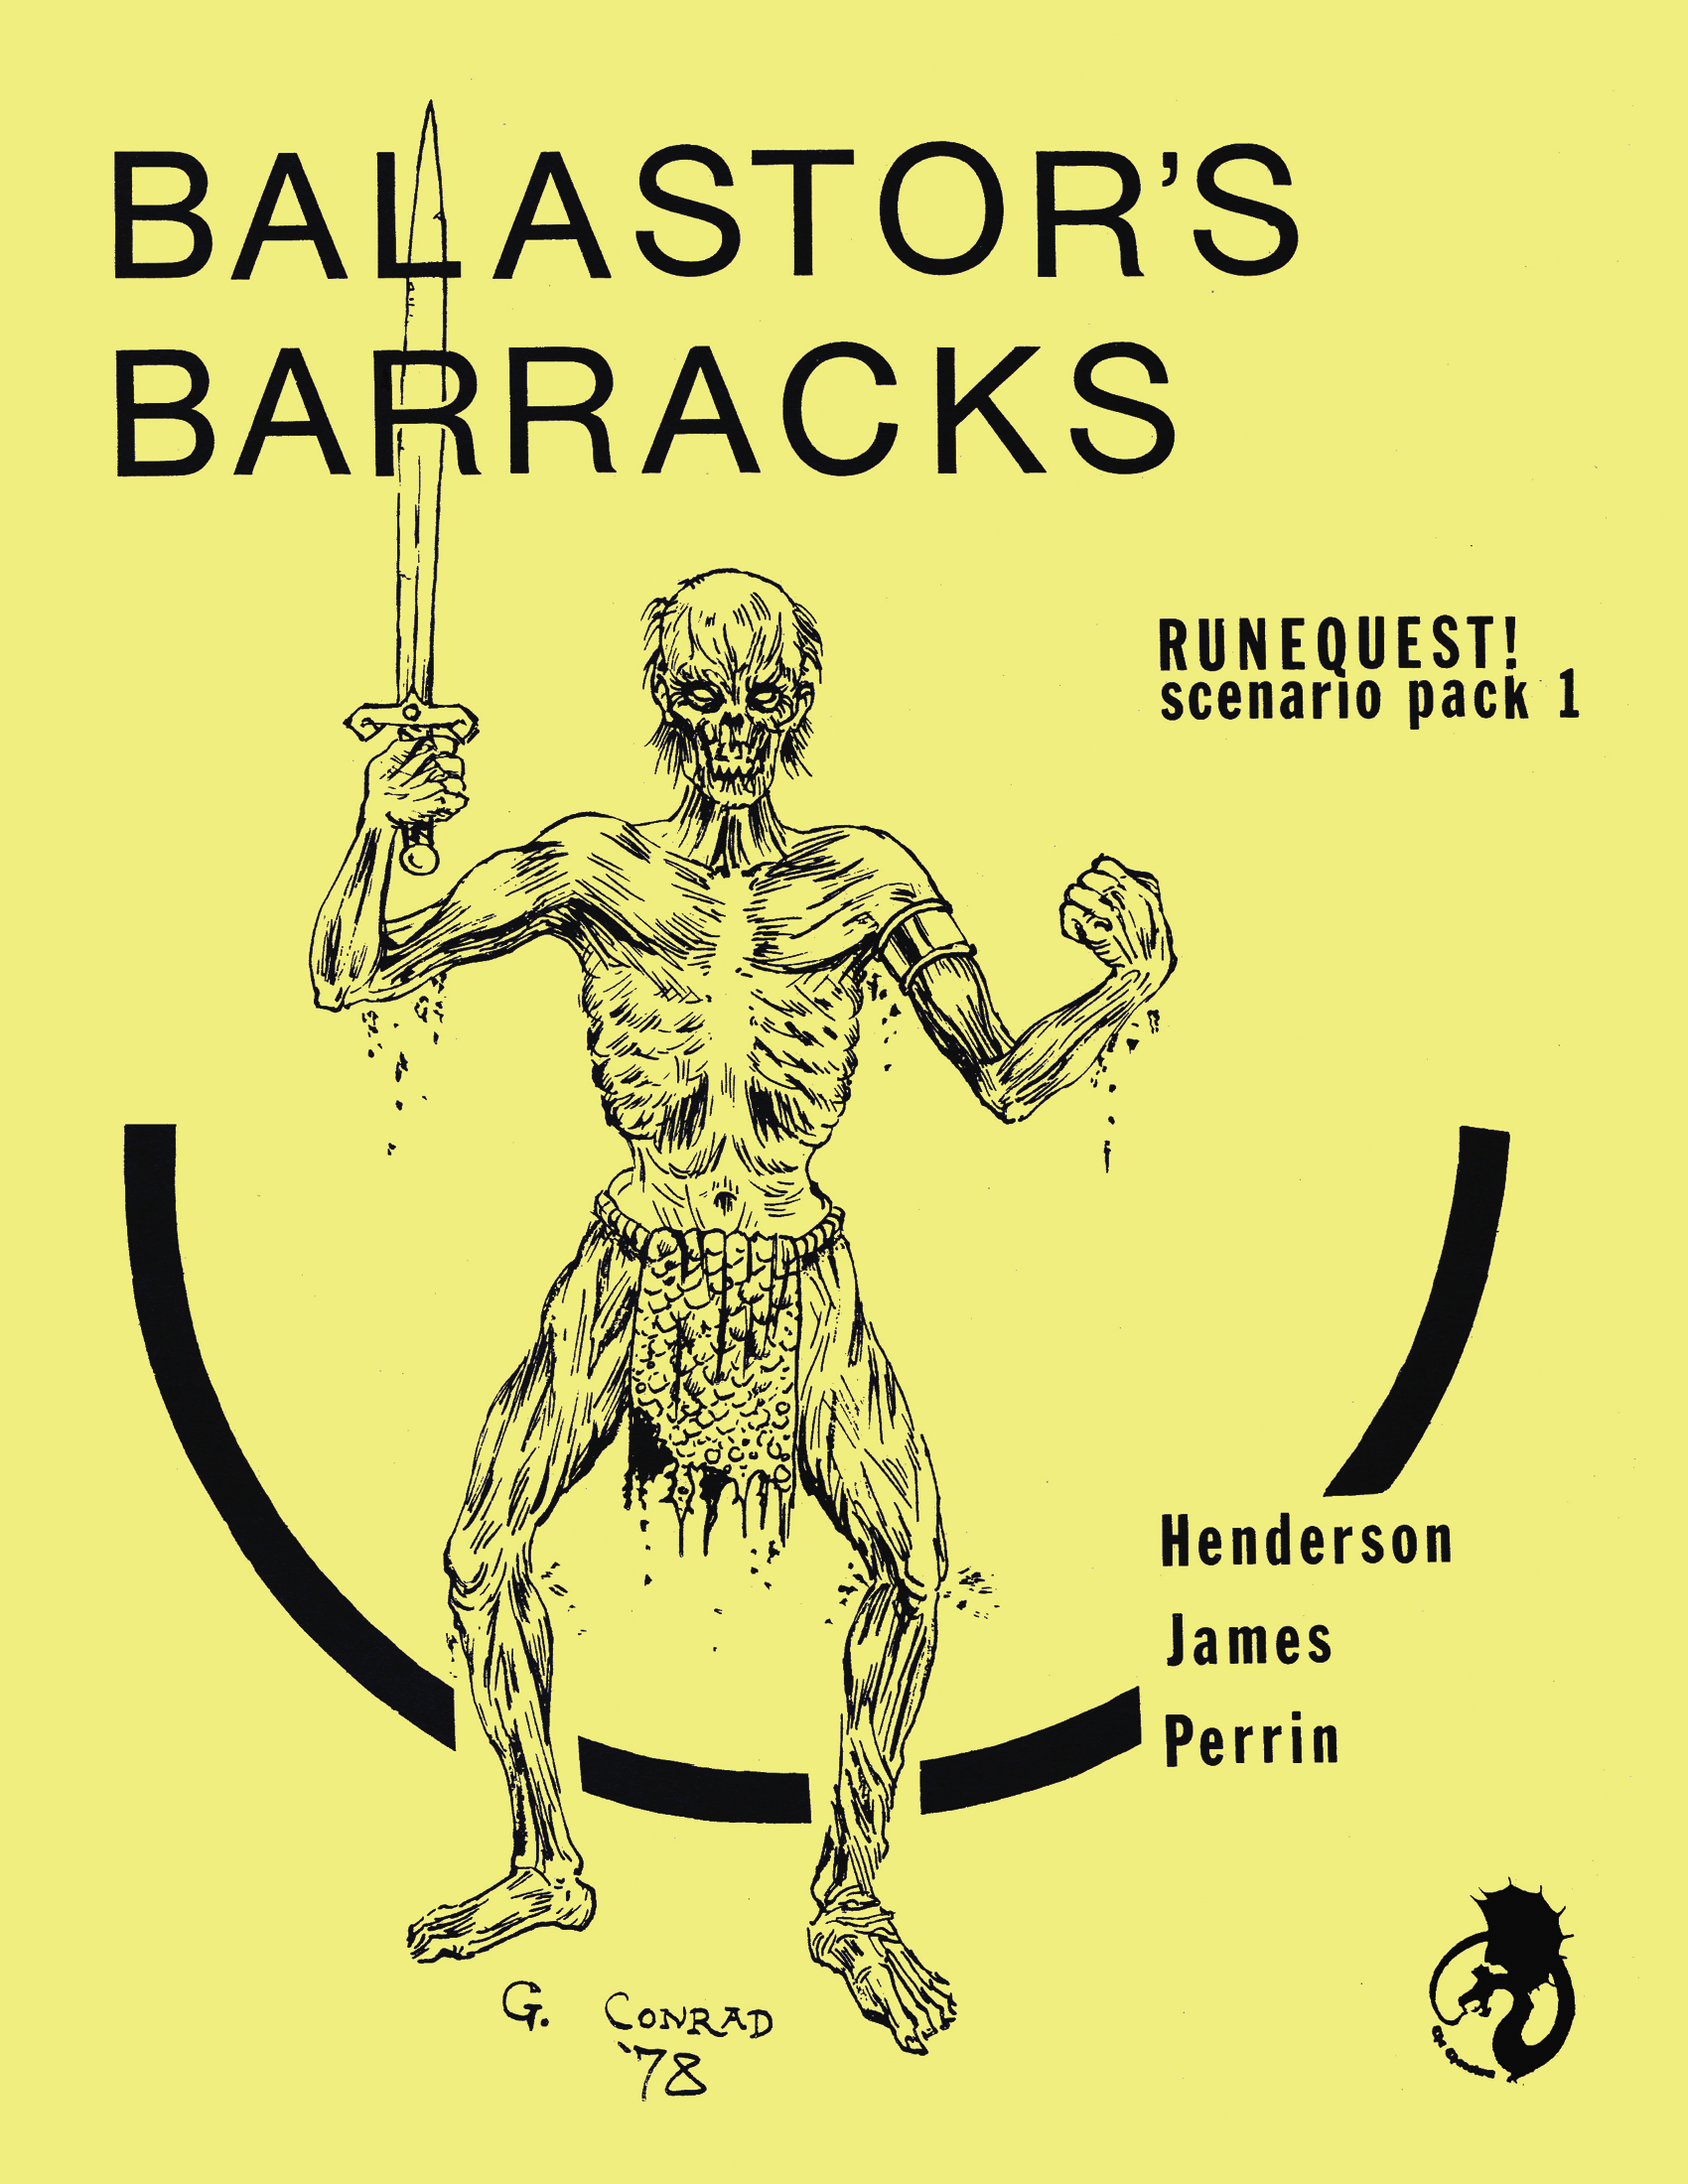 Balastors Barracks